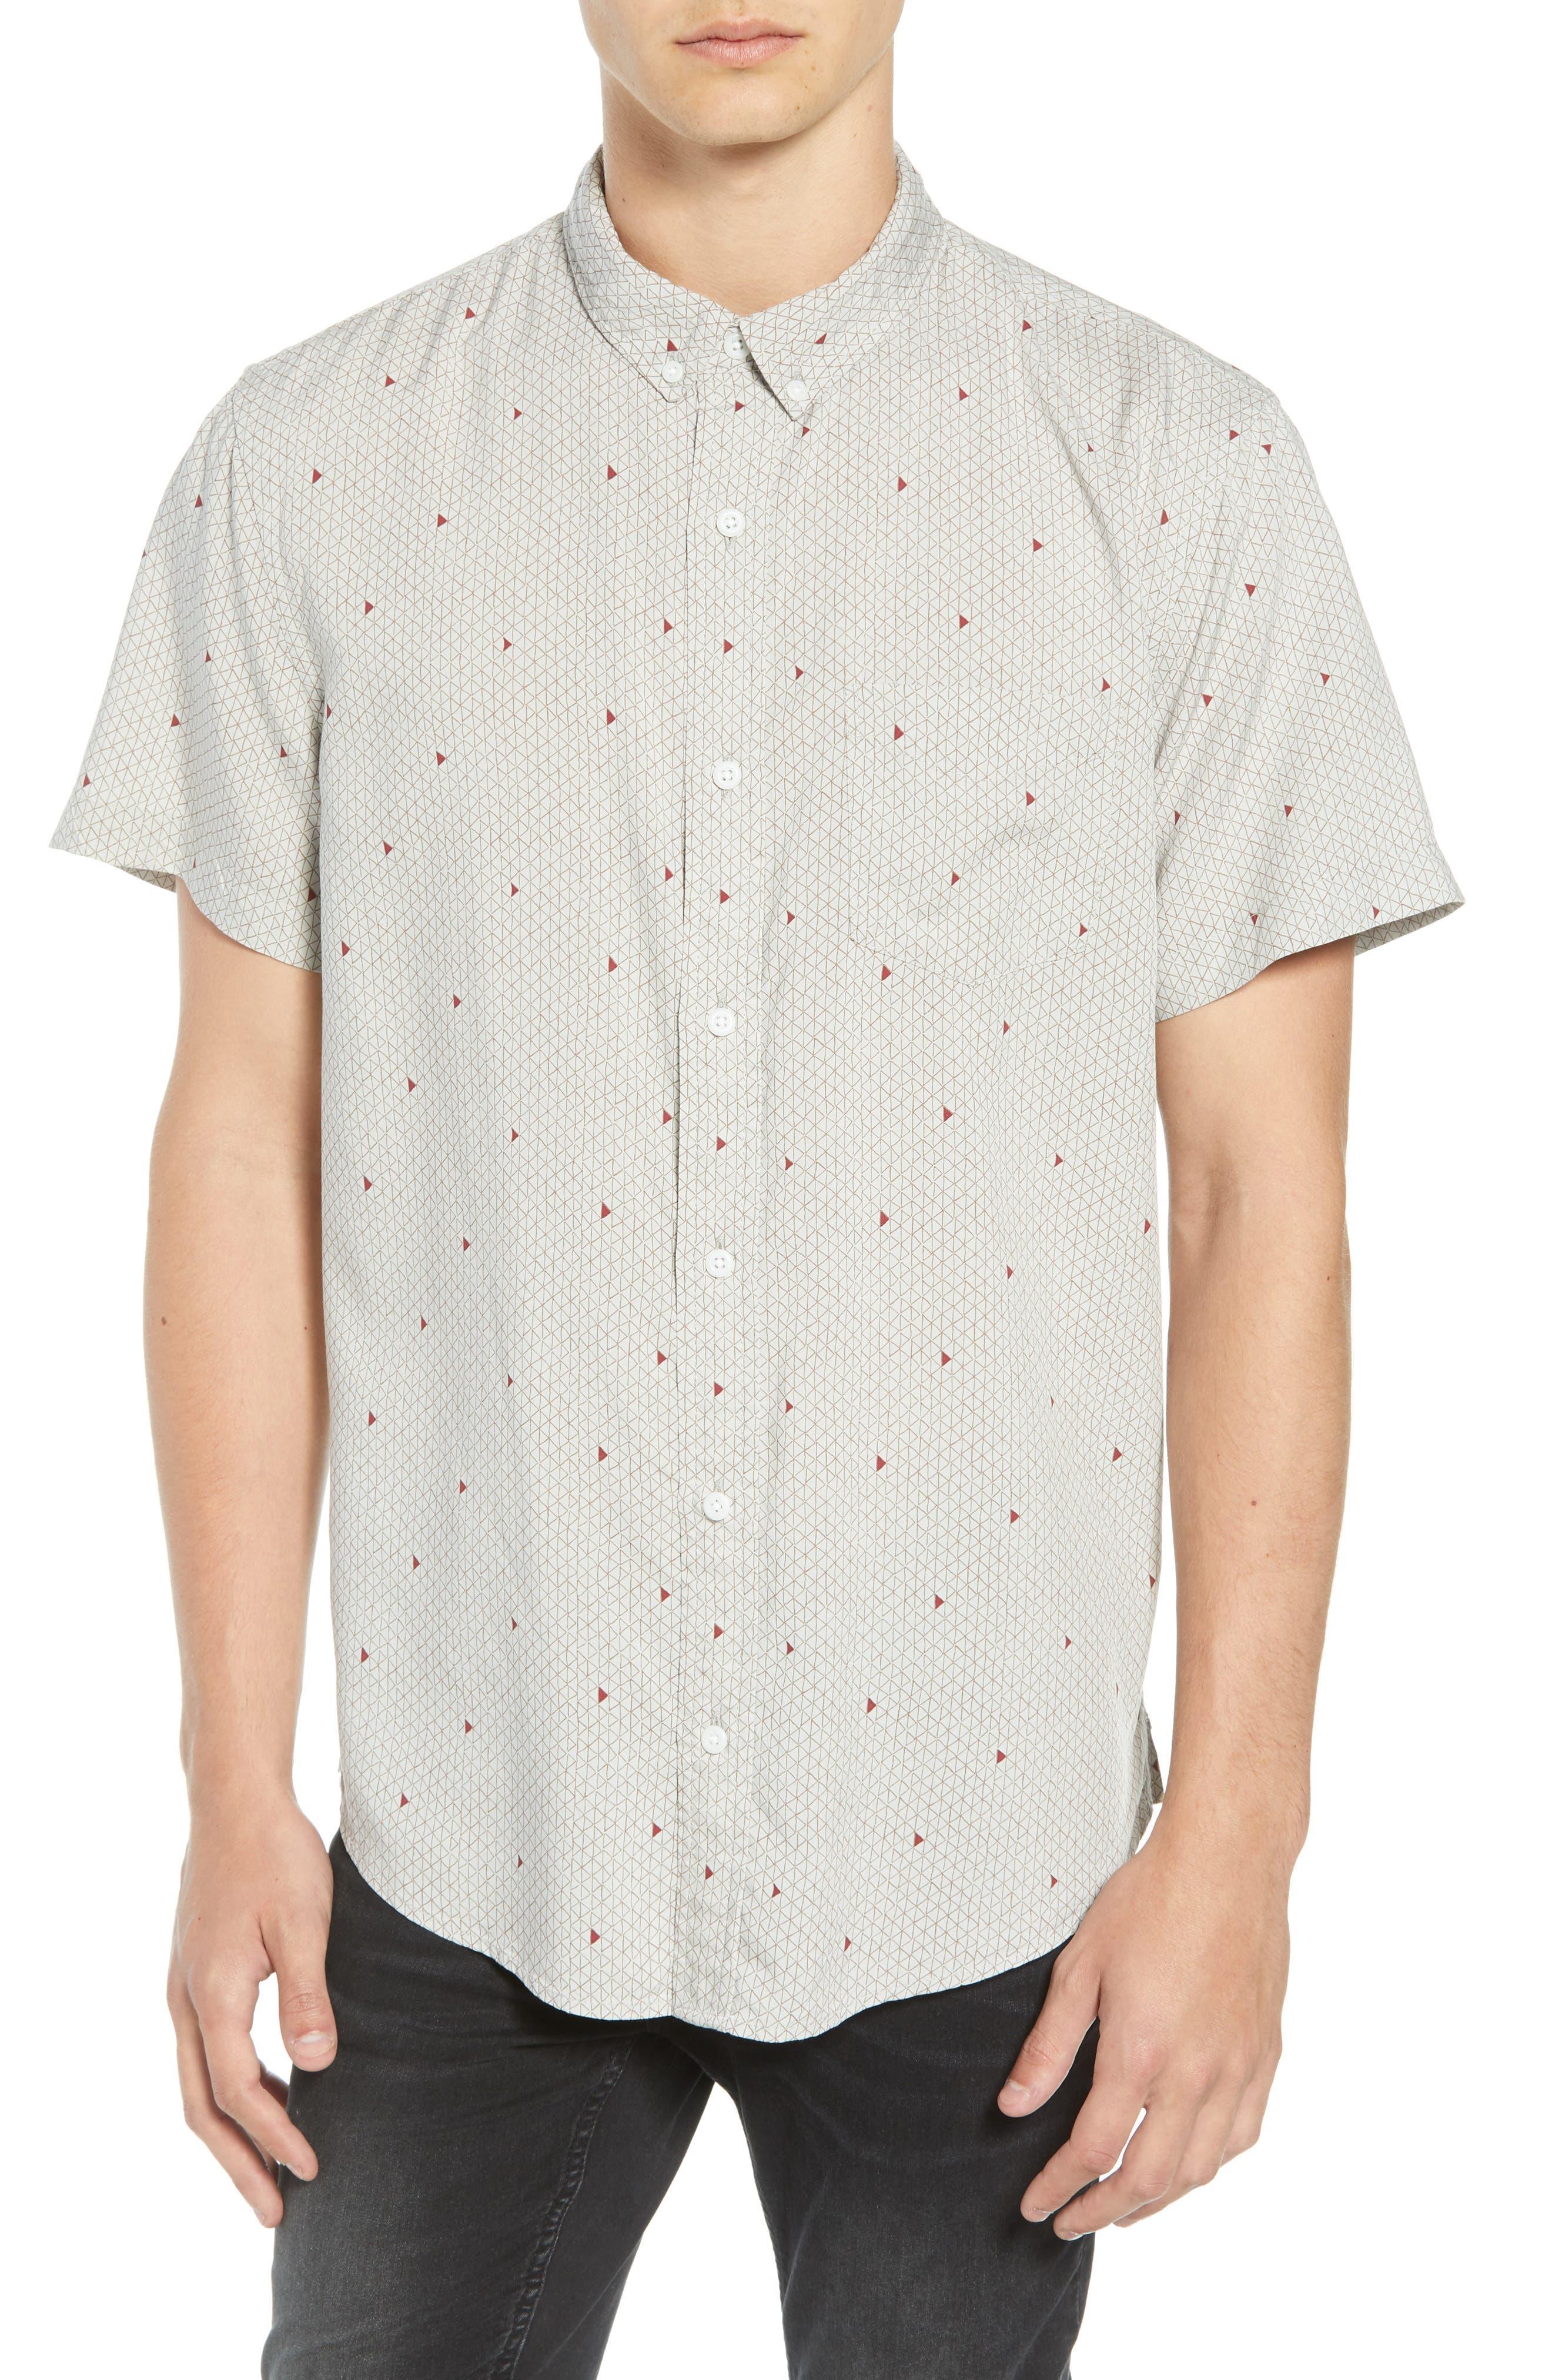 THE RAIL Woven Print Shirt, Main, color, 050